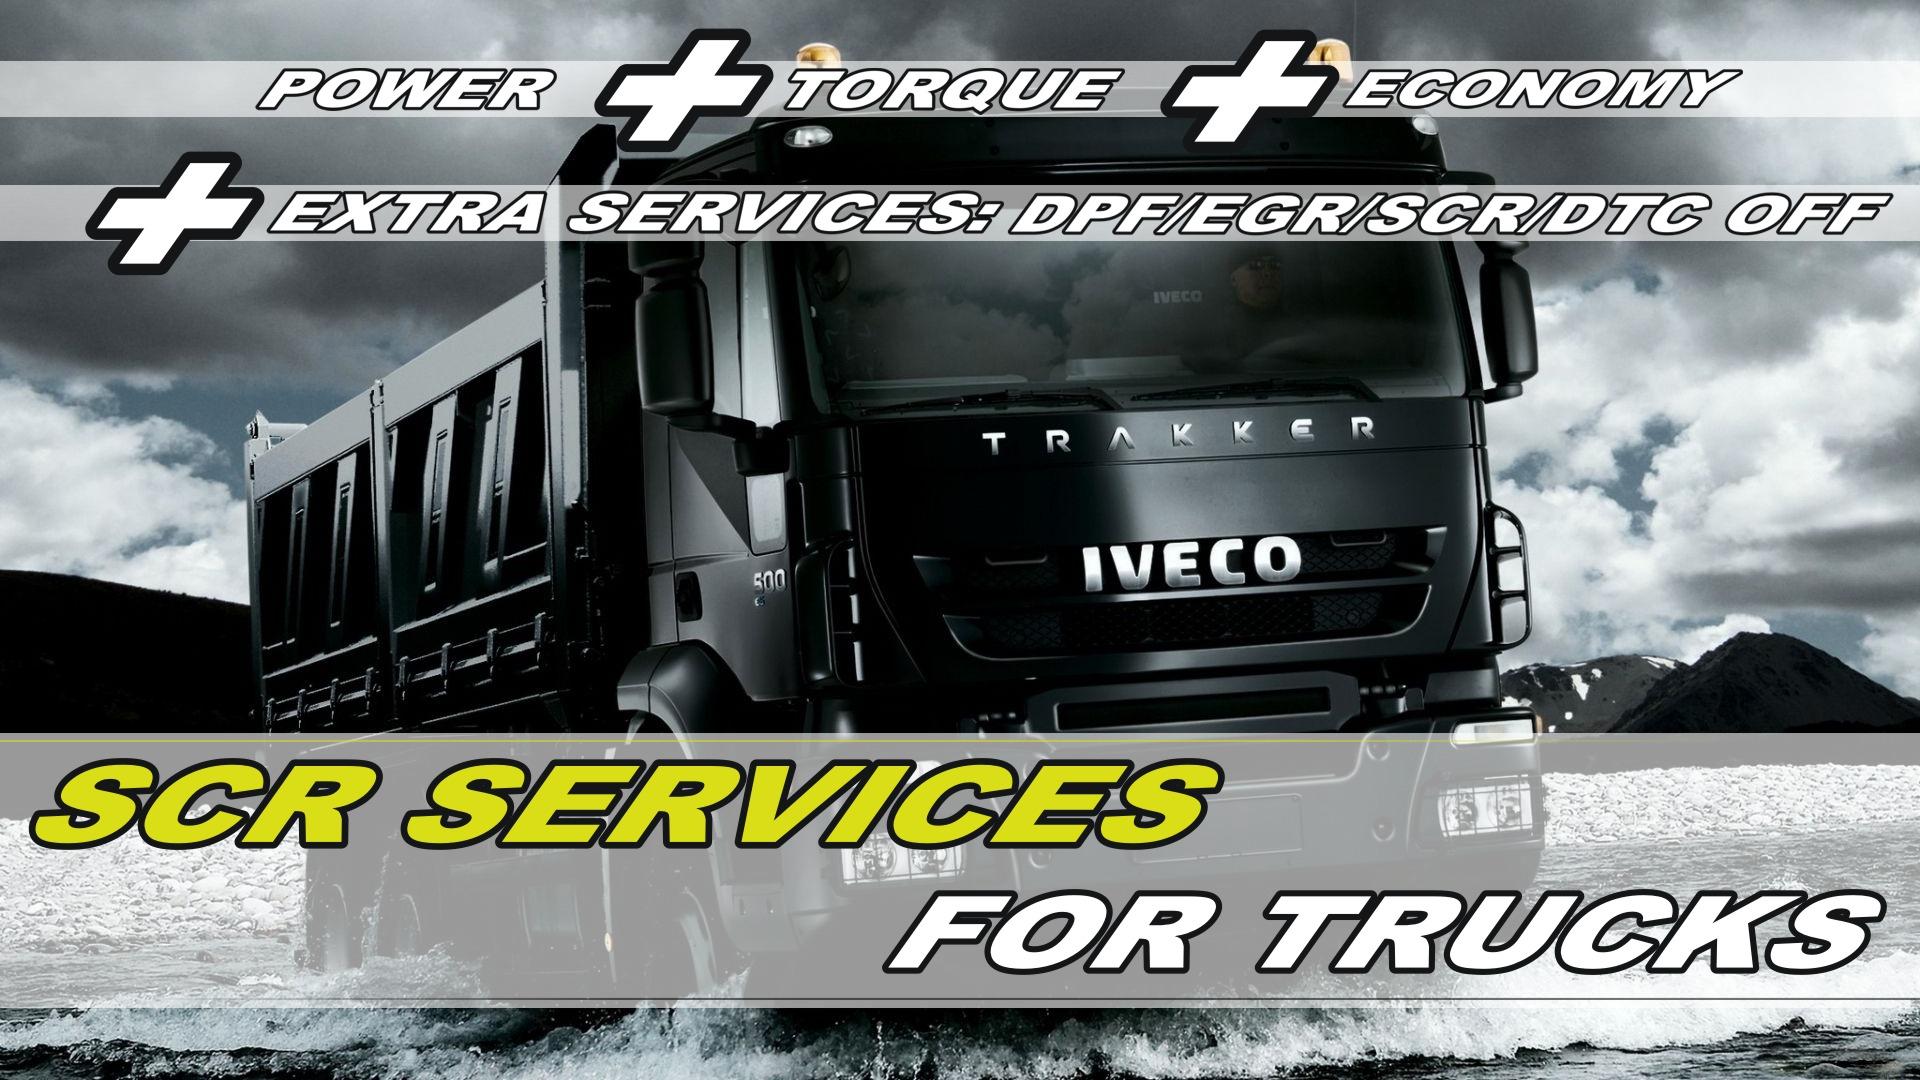 VP T Engineering - SCR/ADBLUE REMOVAL on trucks - VP T